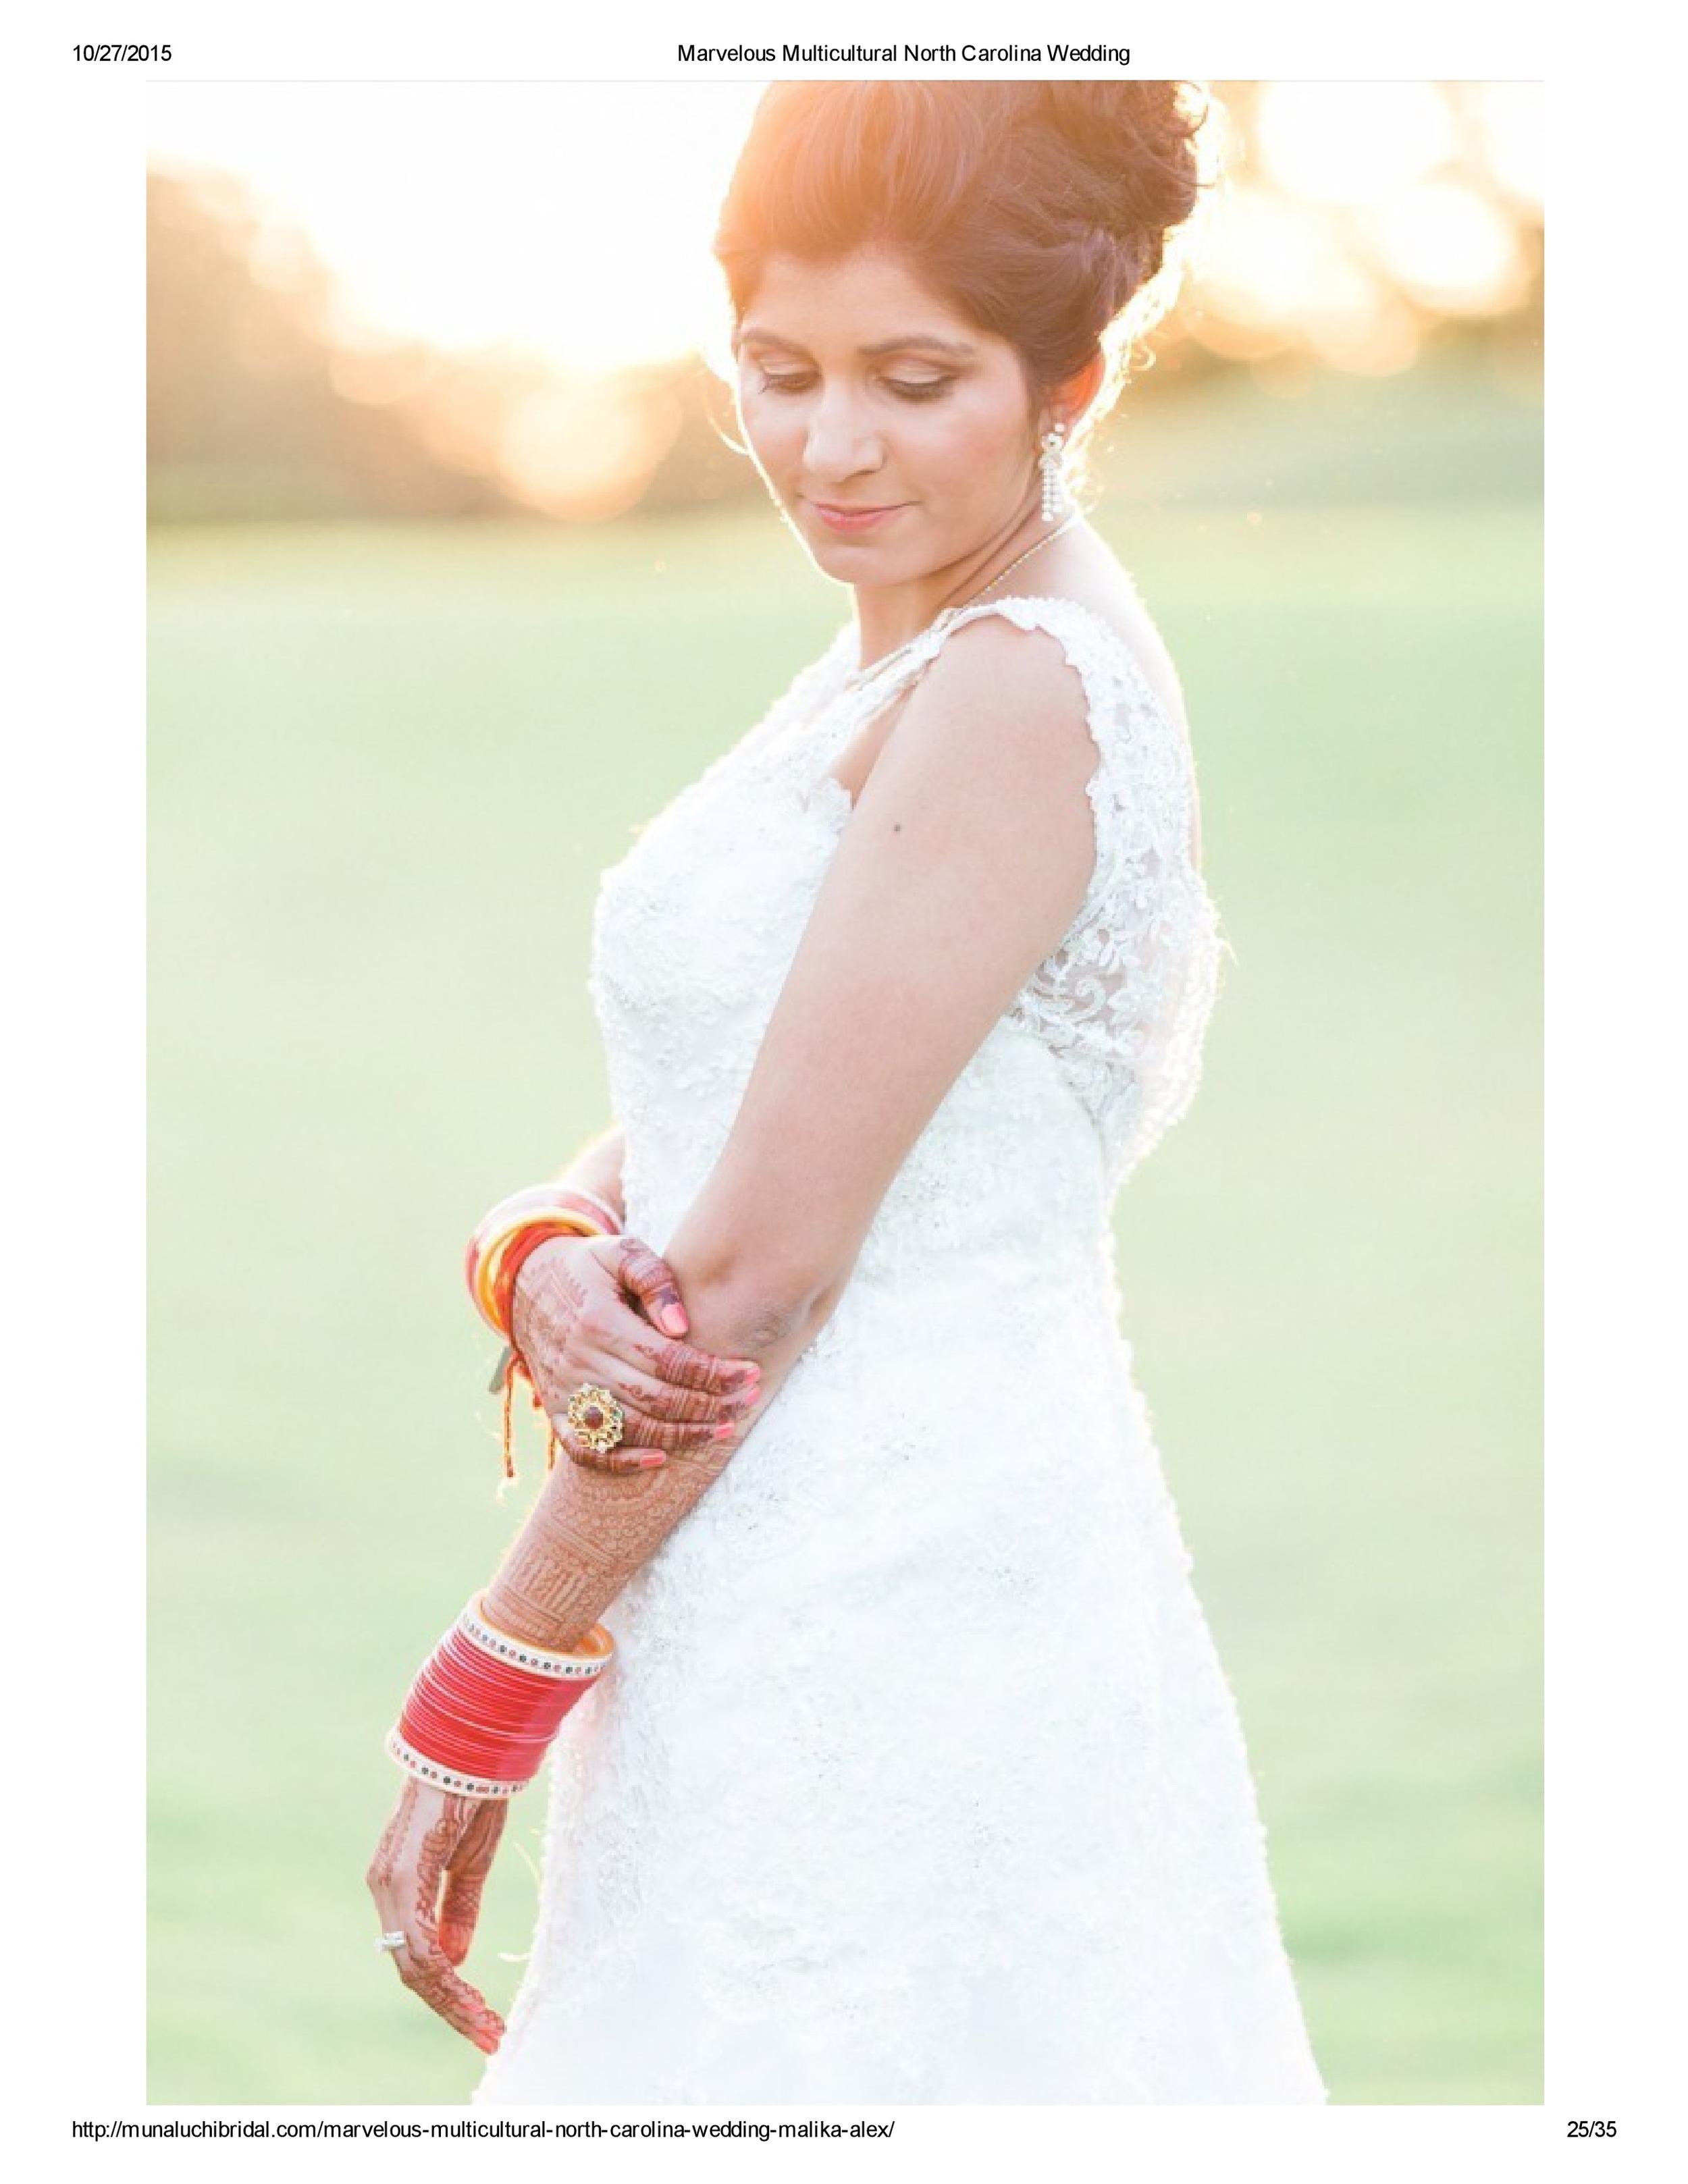 Marvelous Multicultural North Carolina Wedding - Alex & Malika-page-24.jpg